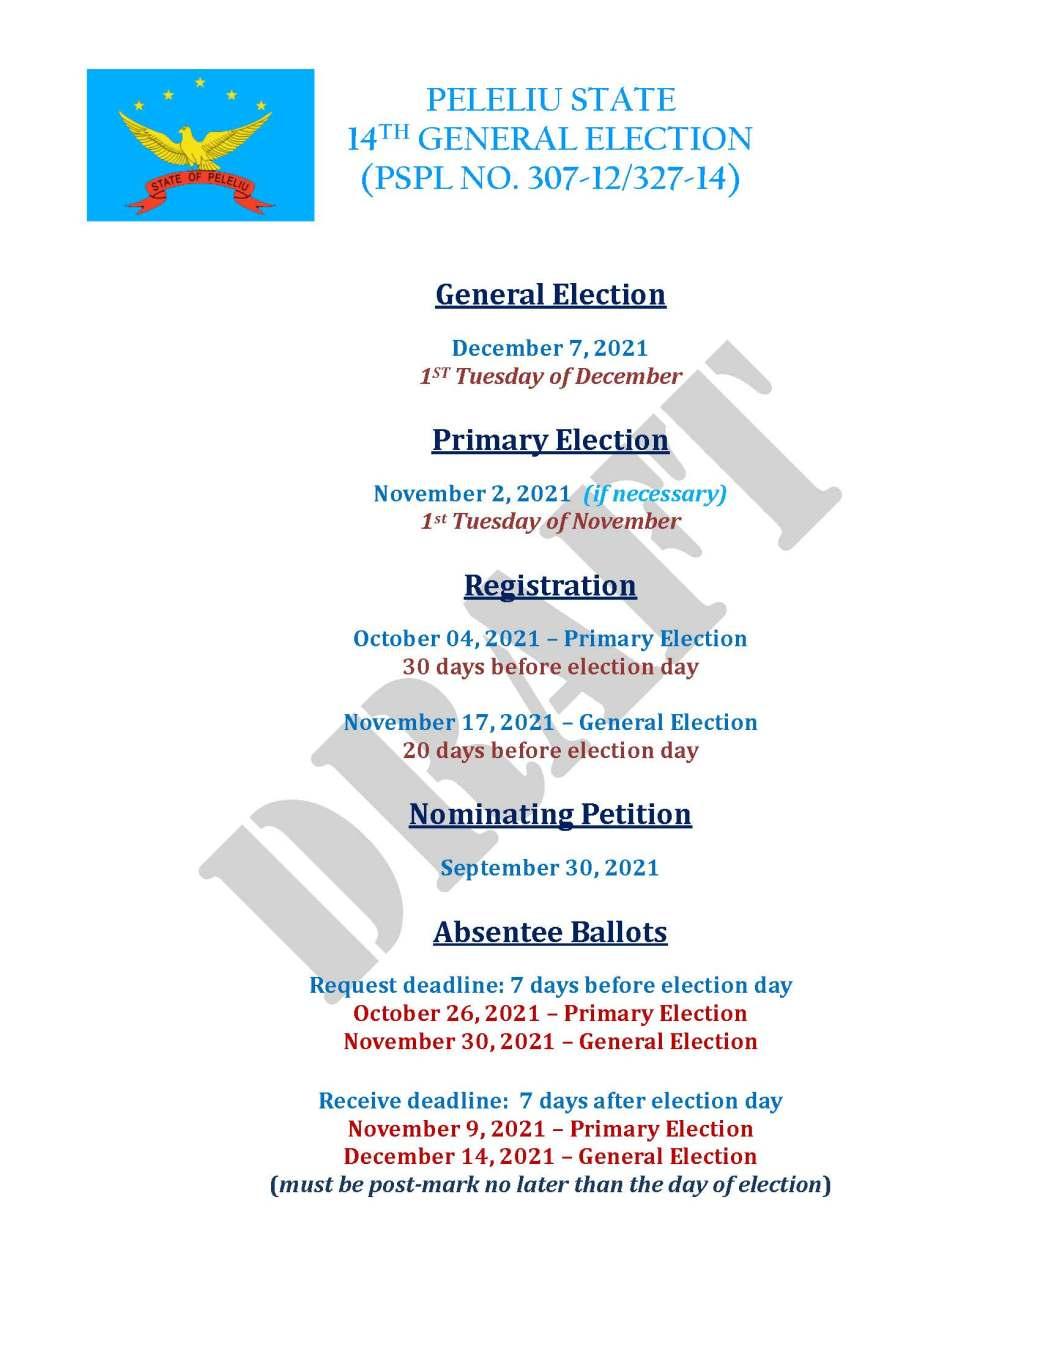 PELELIU ELECTION DATES